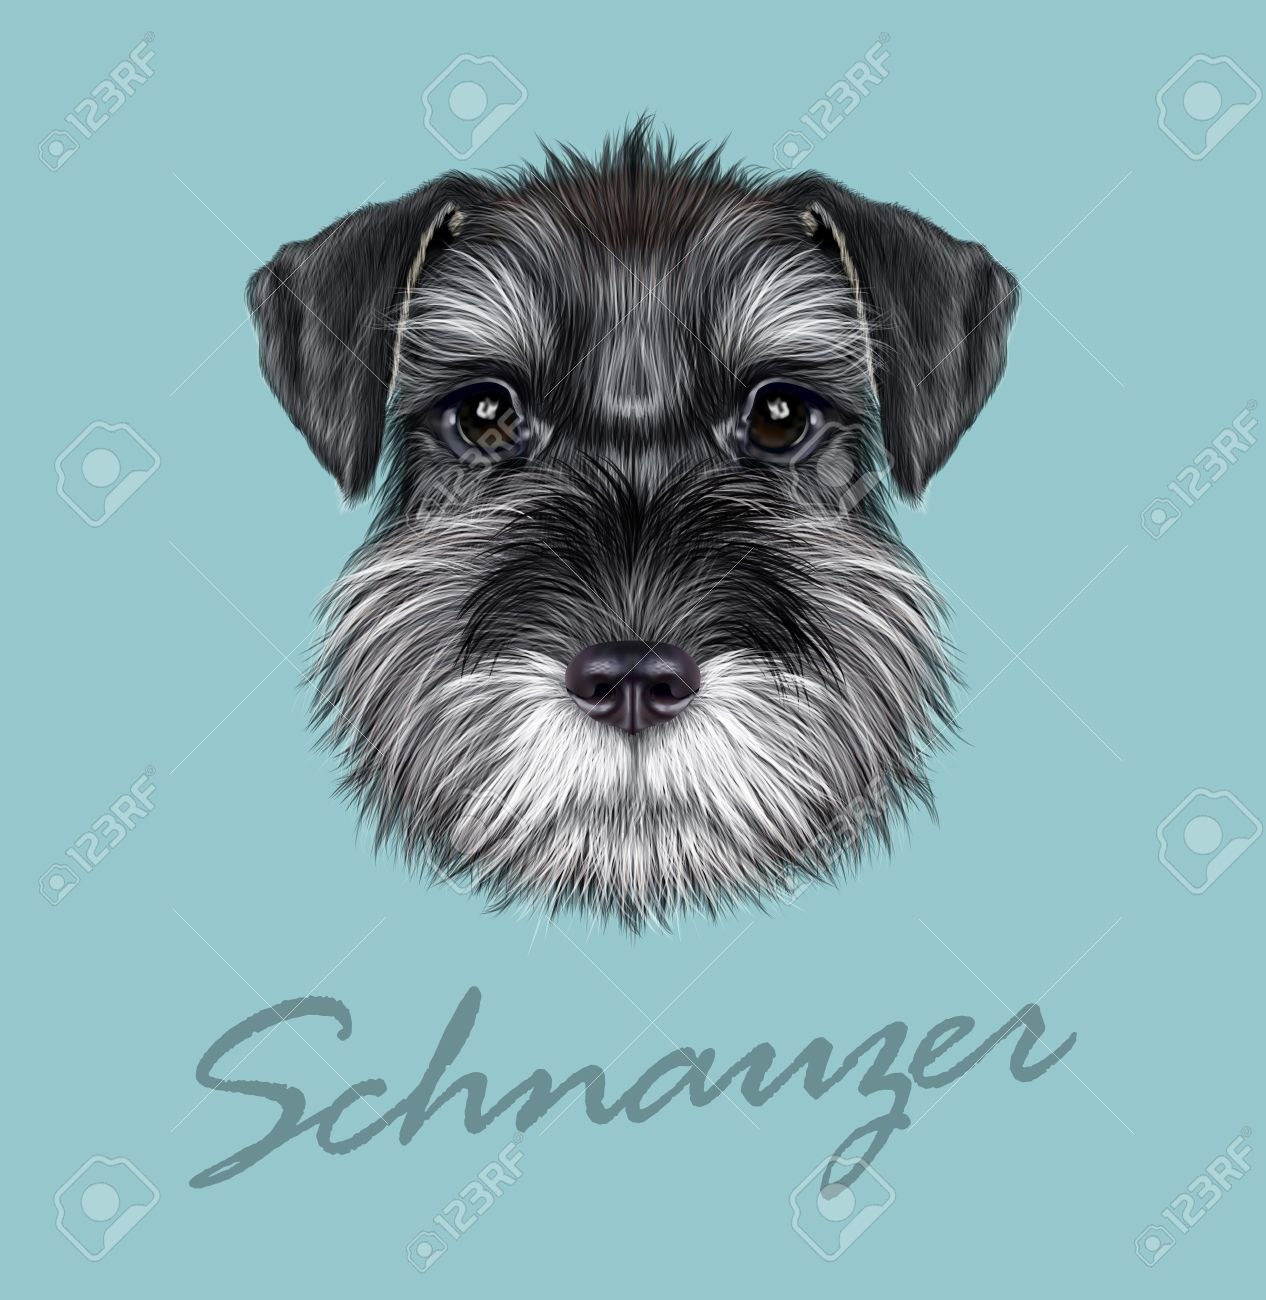 Vector illustrated Portrait of Black Schnauzer on blue background. - 51561889